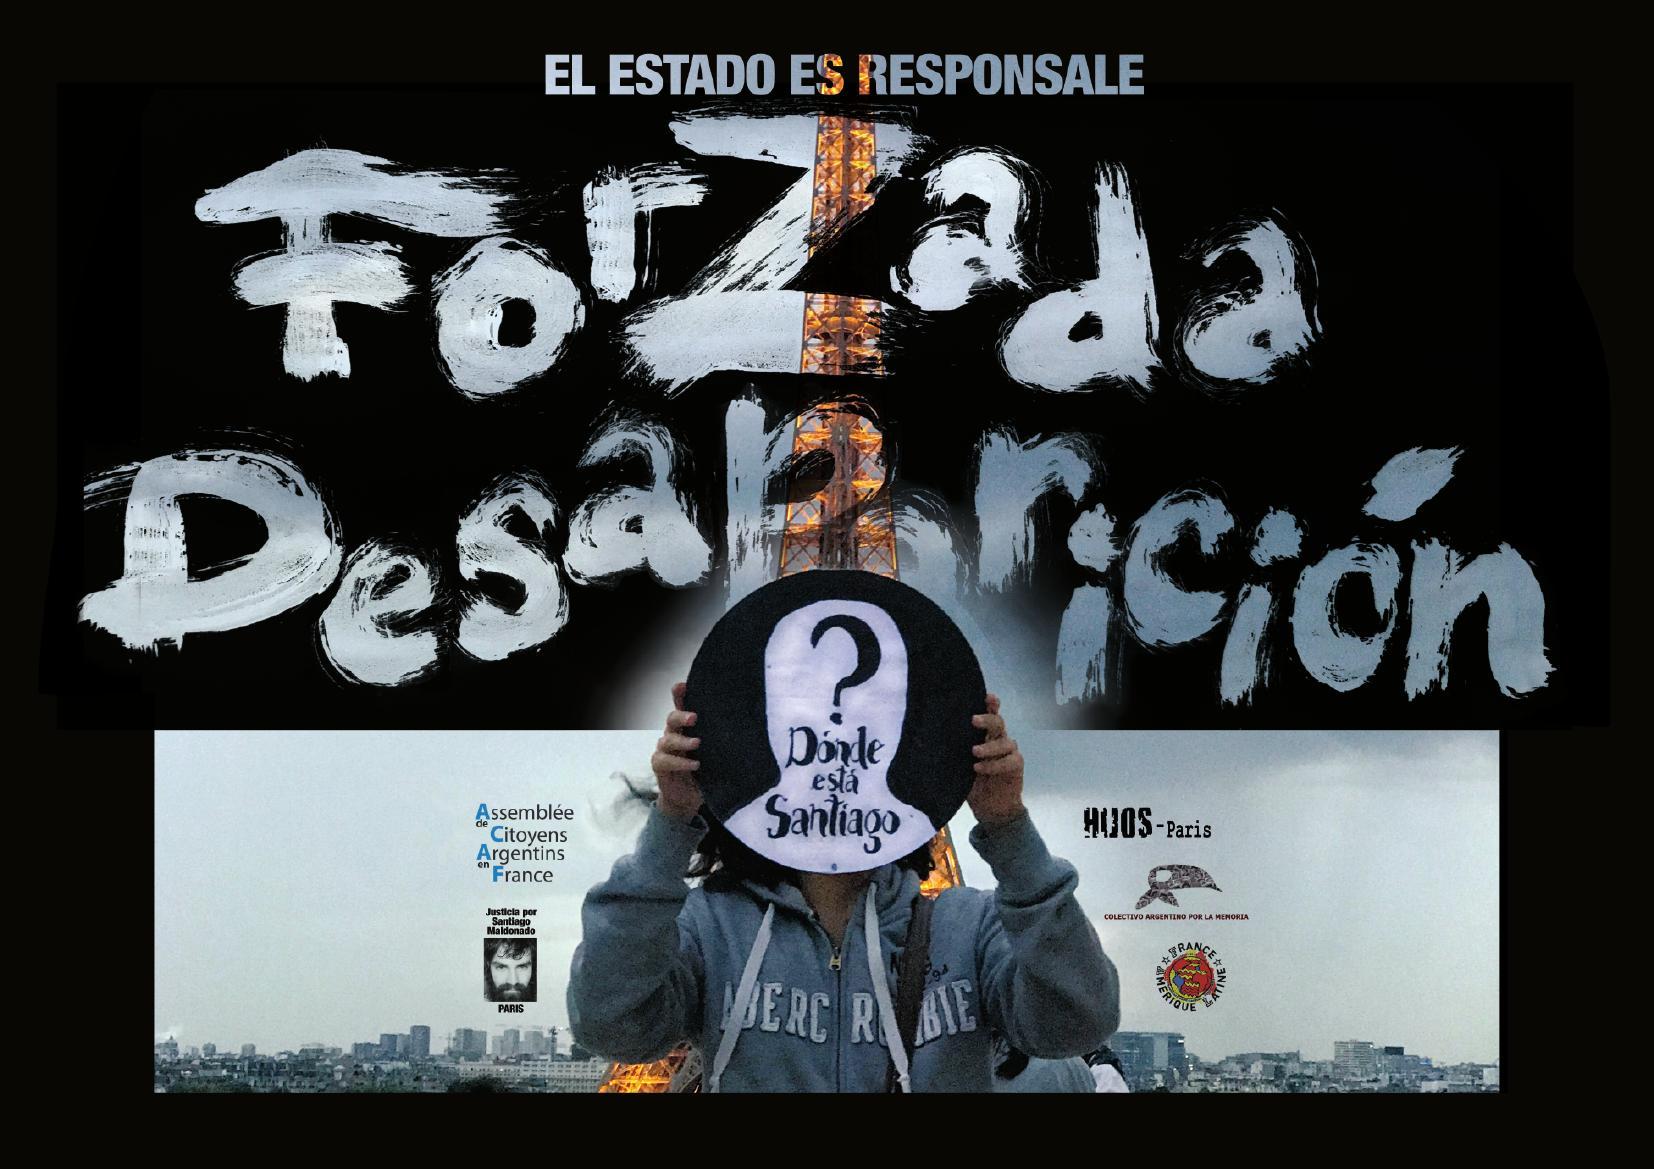 Mort de Santiago Maldonado: l'État est responsable (communiqué)